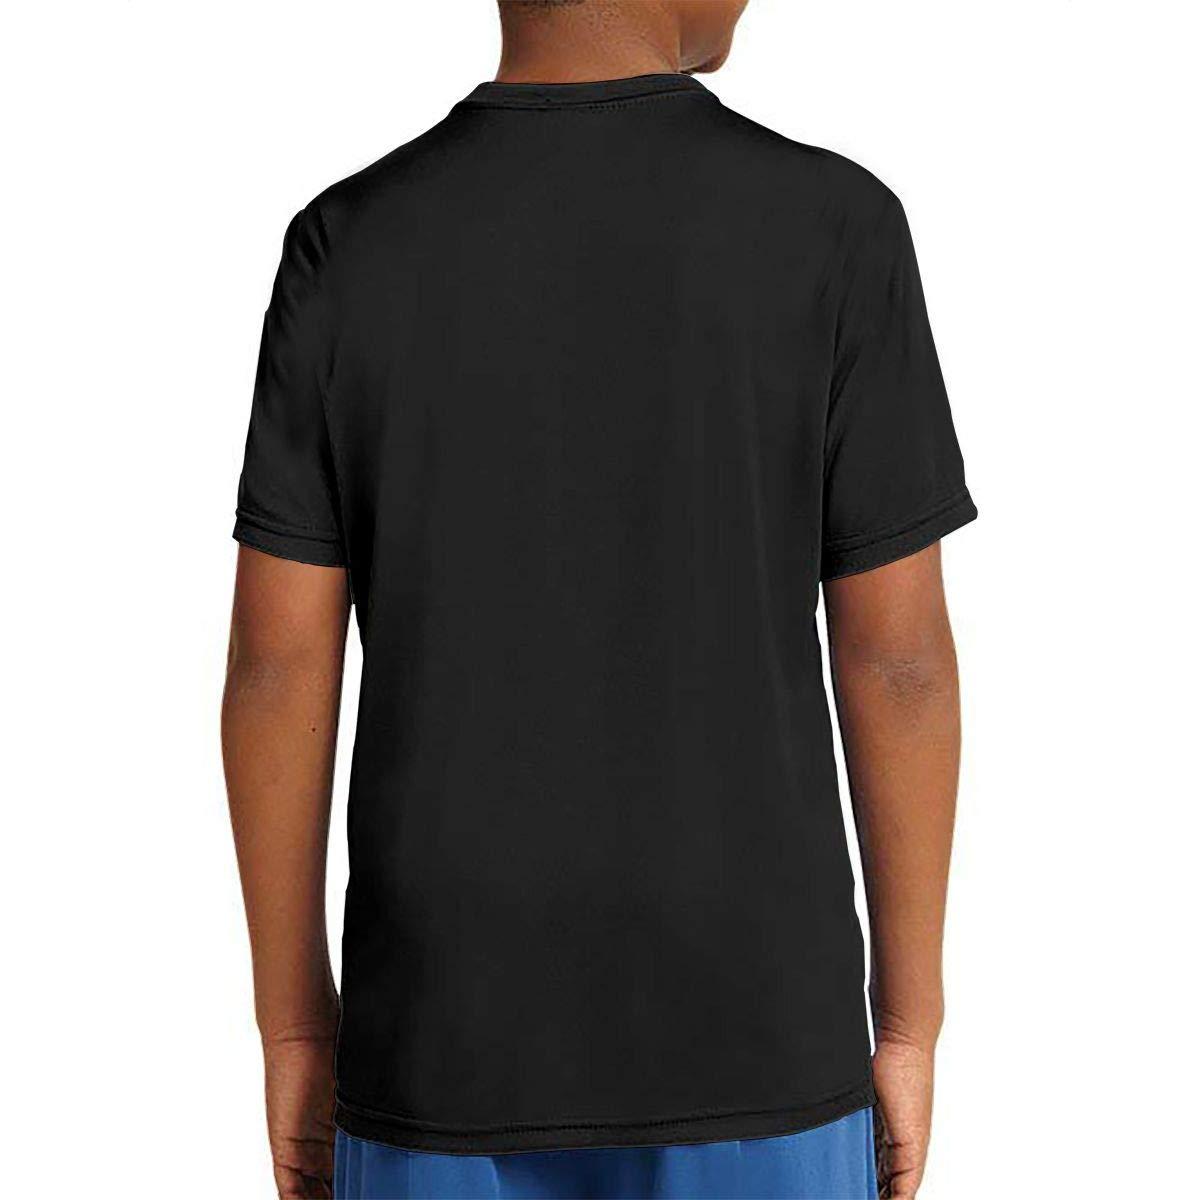 4GHdogQ Flogging Molly Boys Teens Group Short Sleeve T-Shirt